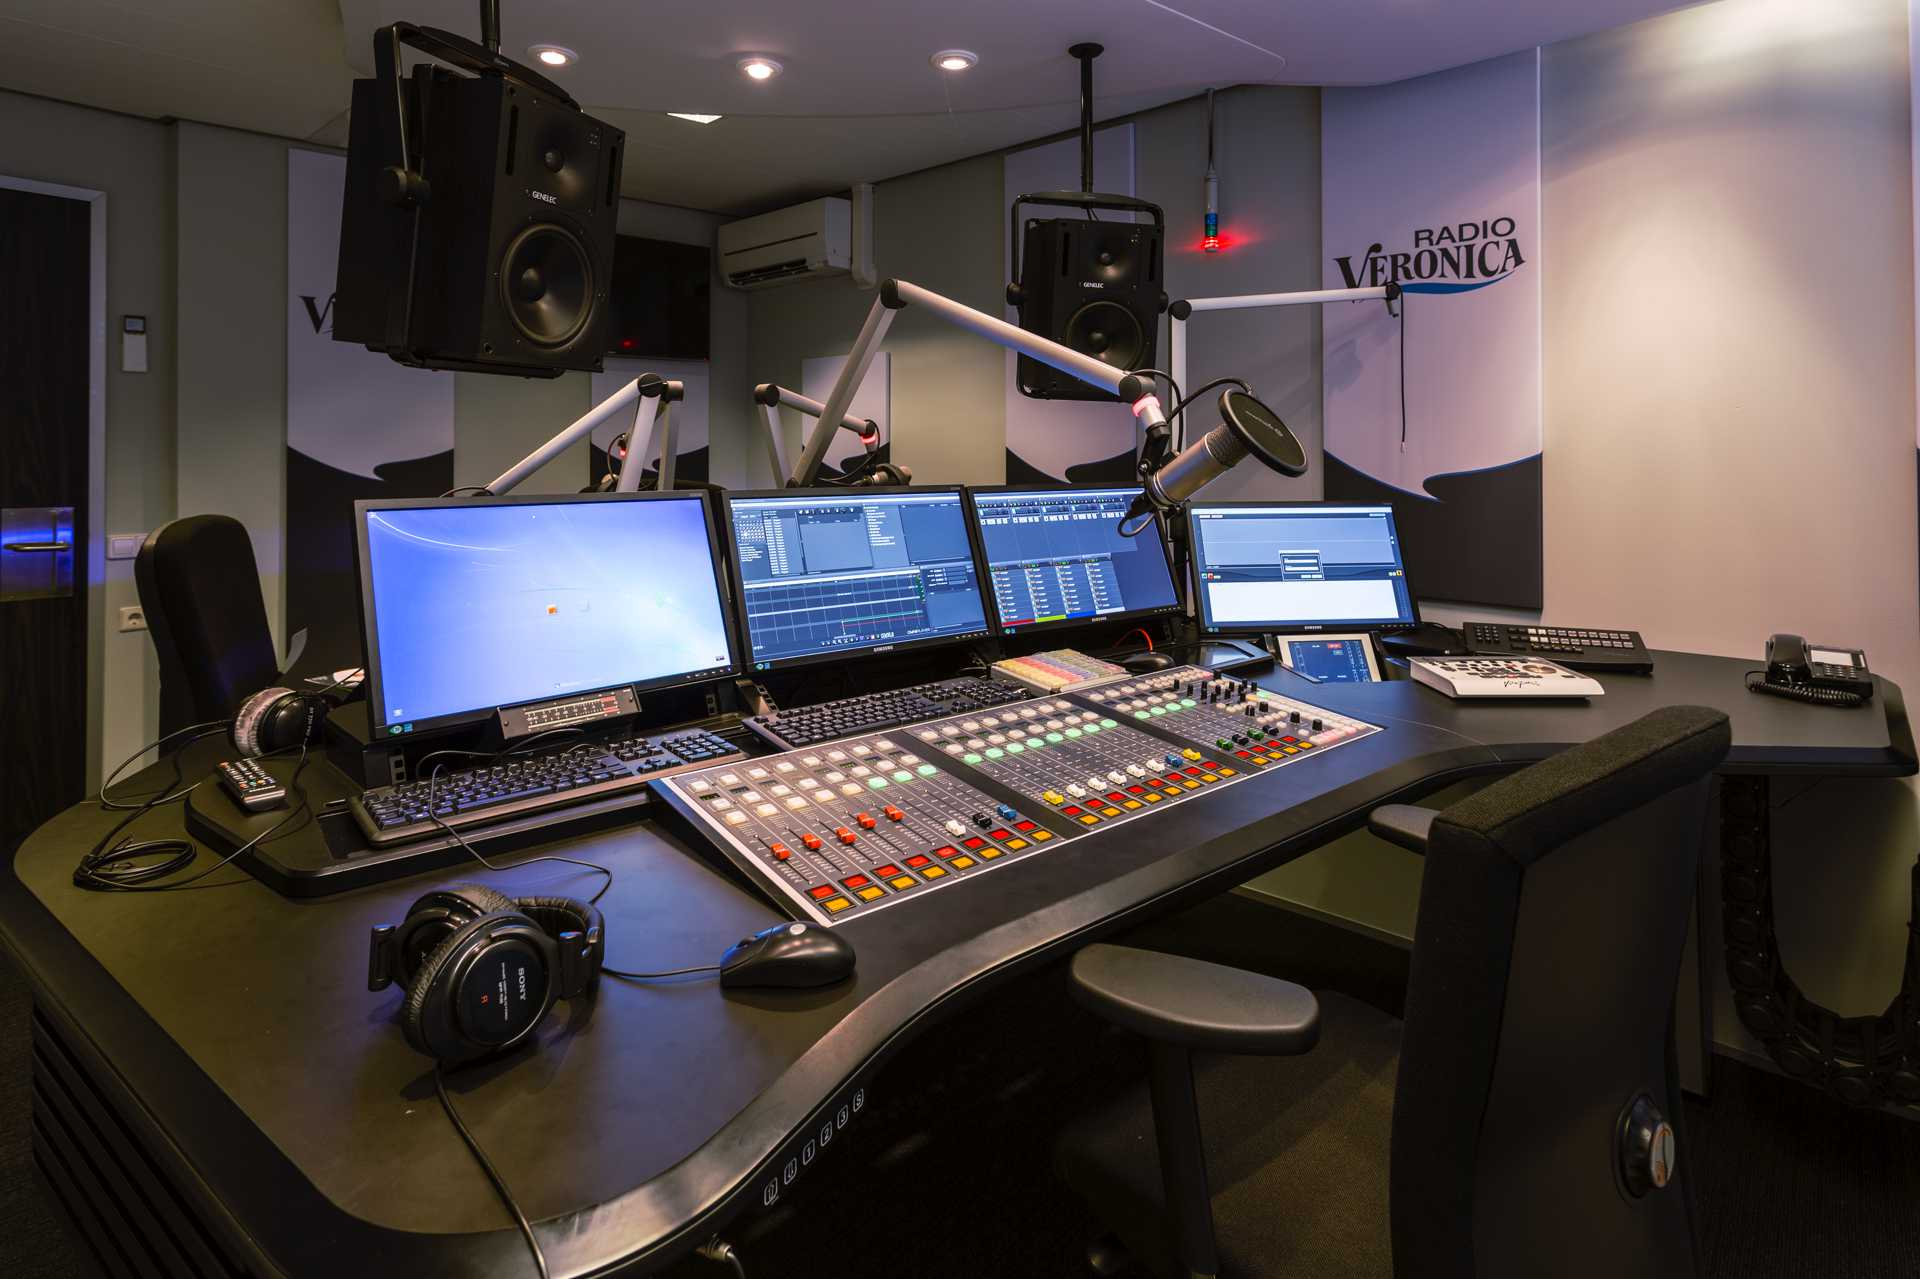 Radio veronica voice track 2 kb mf - Meubels studio ...